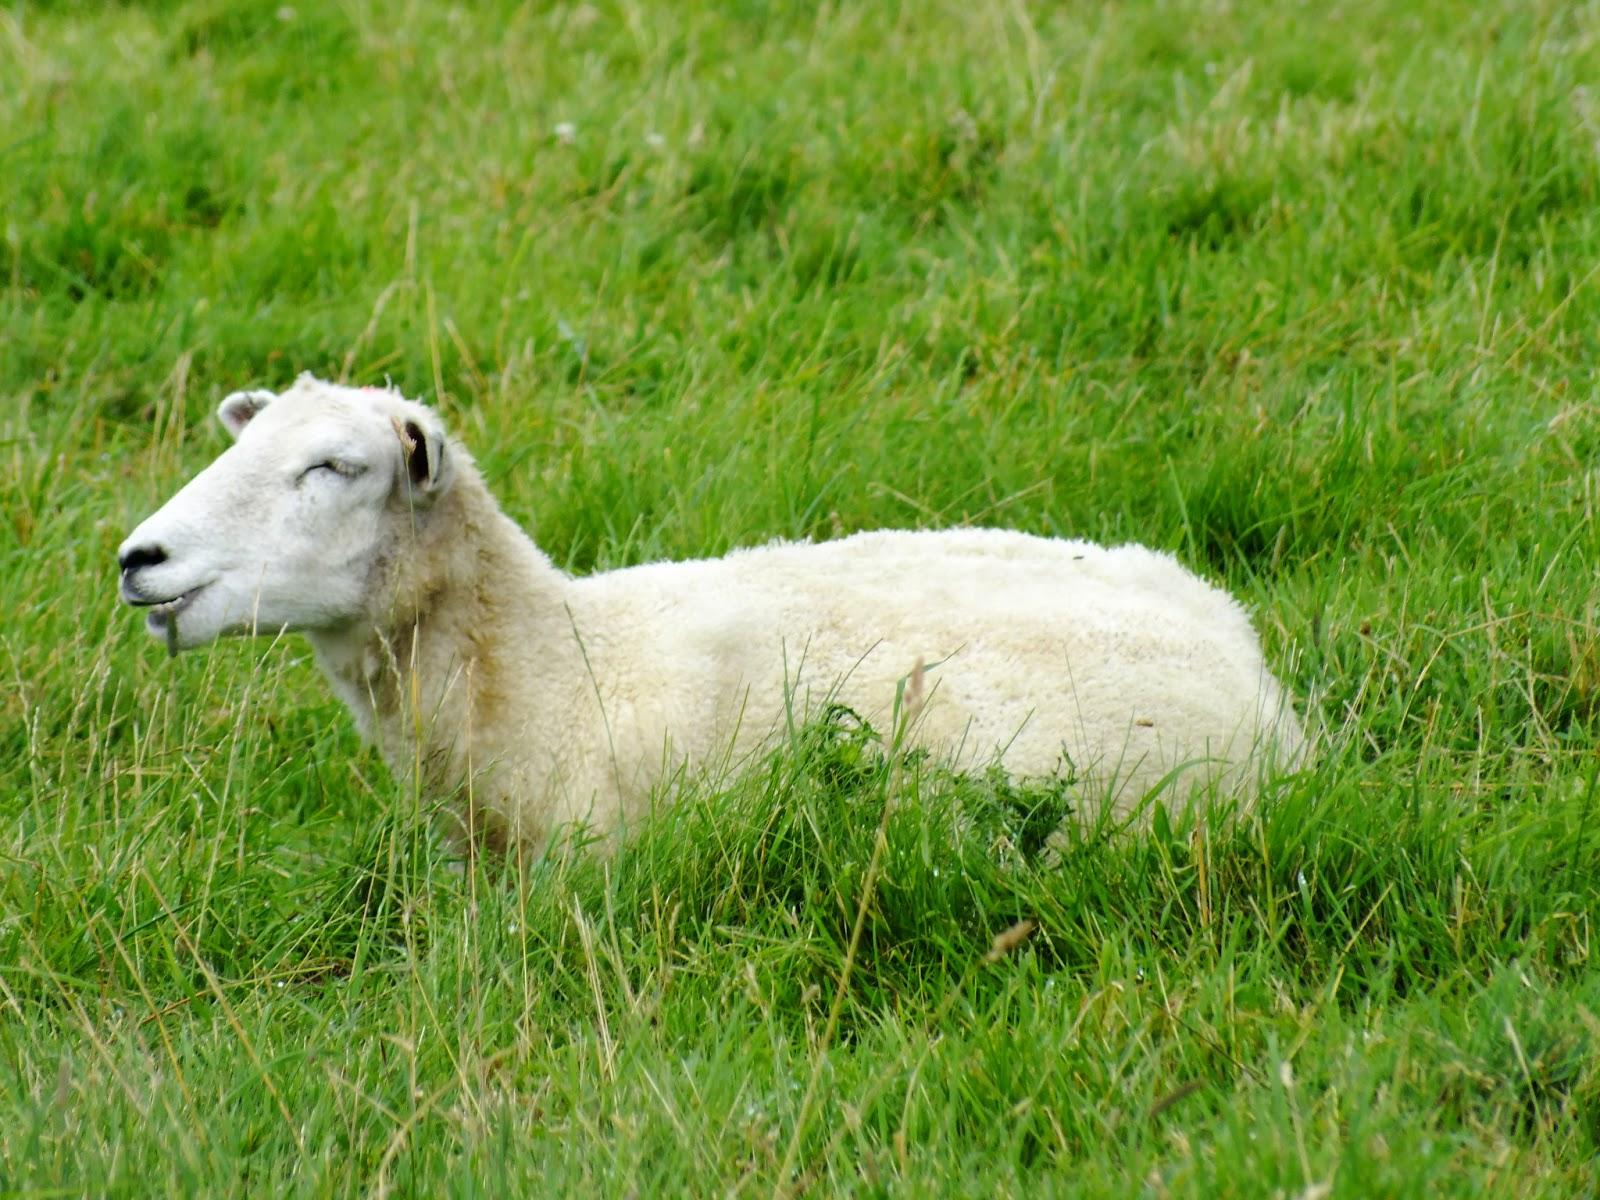 owieczka, owca